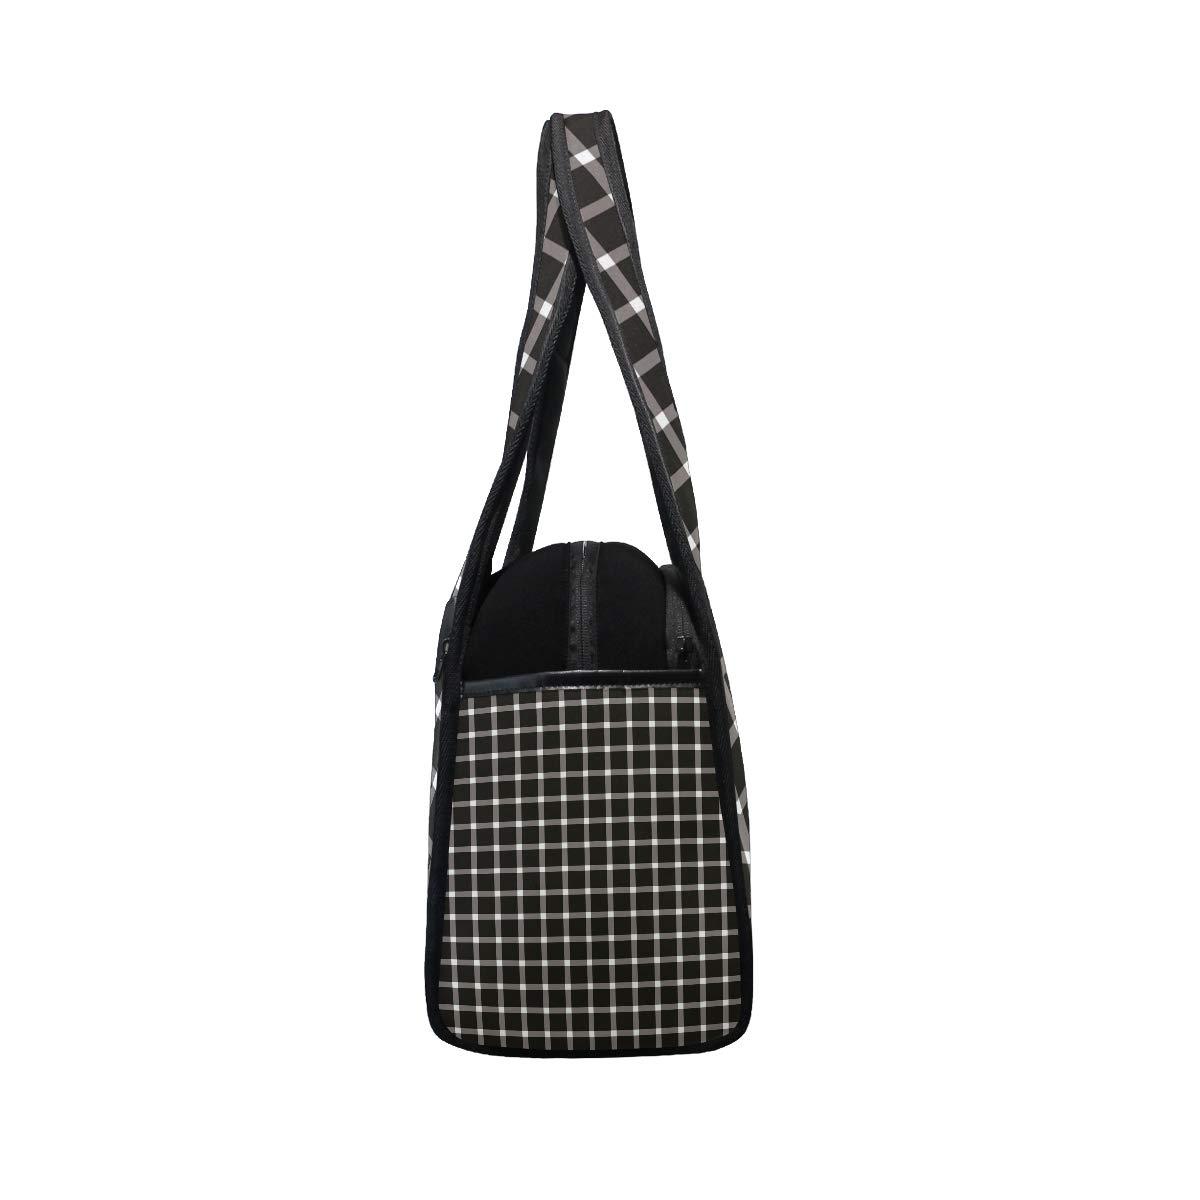 Unisex Travel Duffels Gym Bag Black And White Plaid Canvas Weekender Bag Shoulder Bag Totes bags